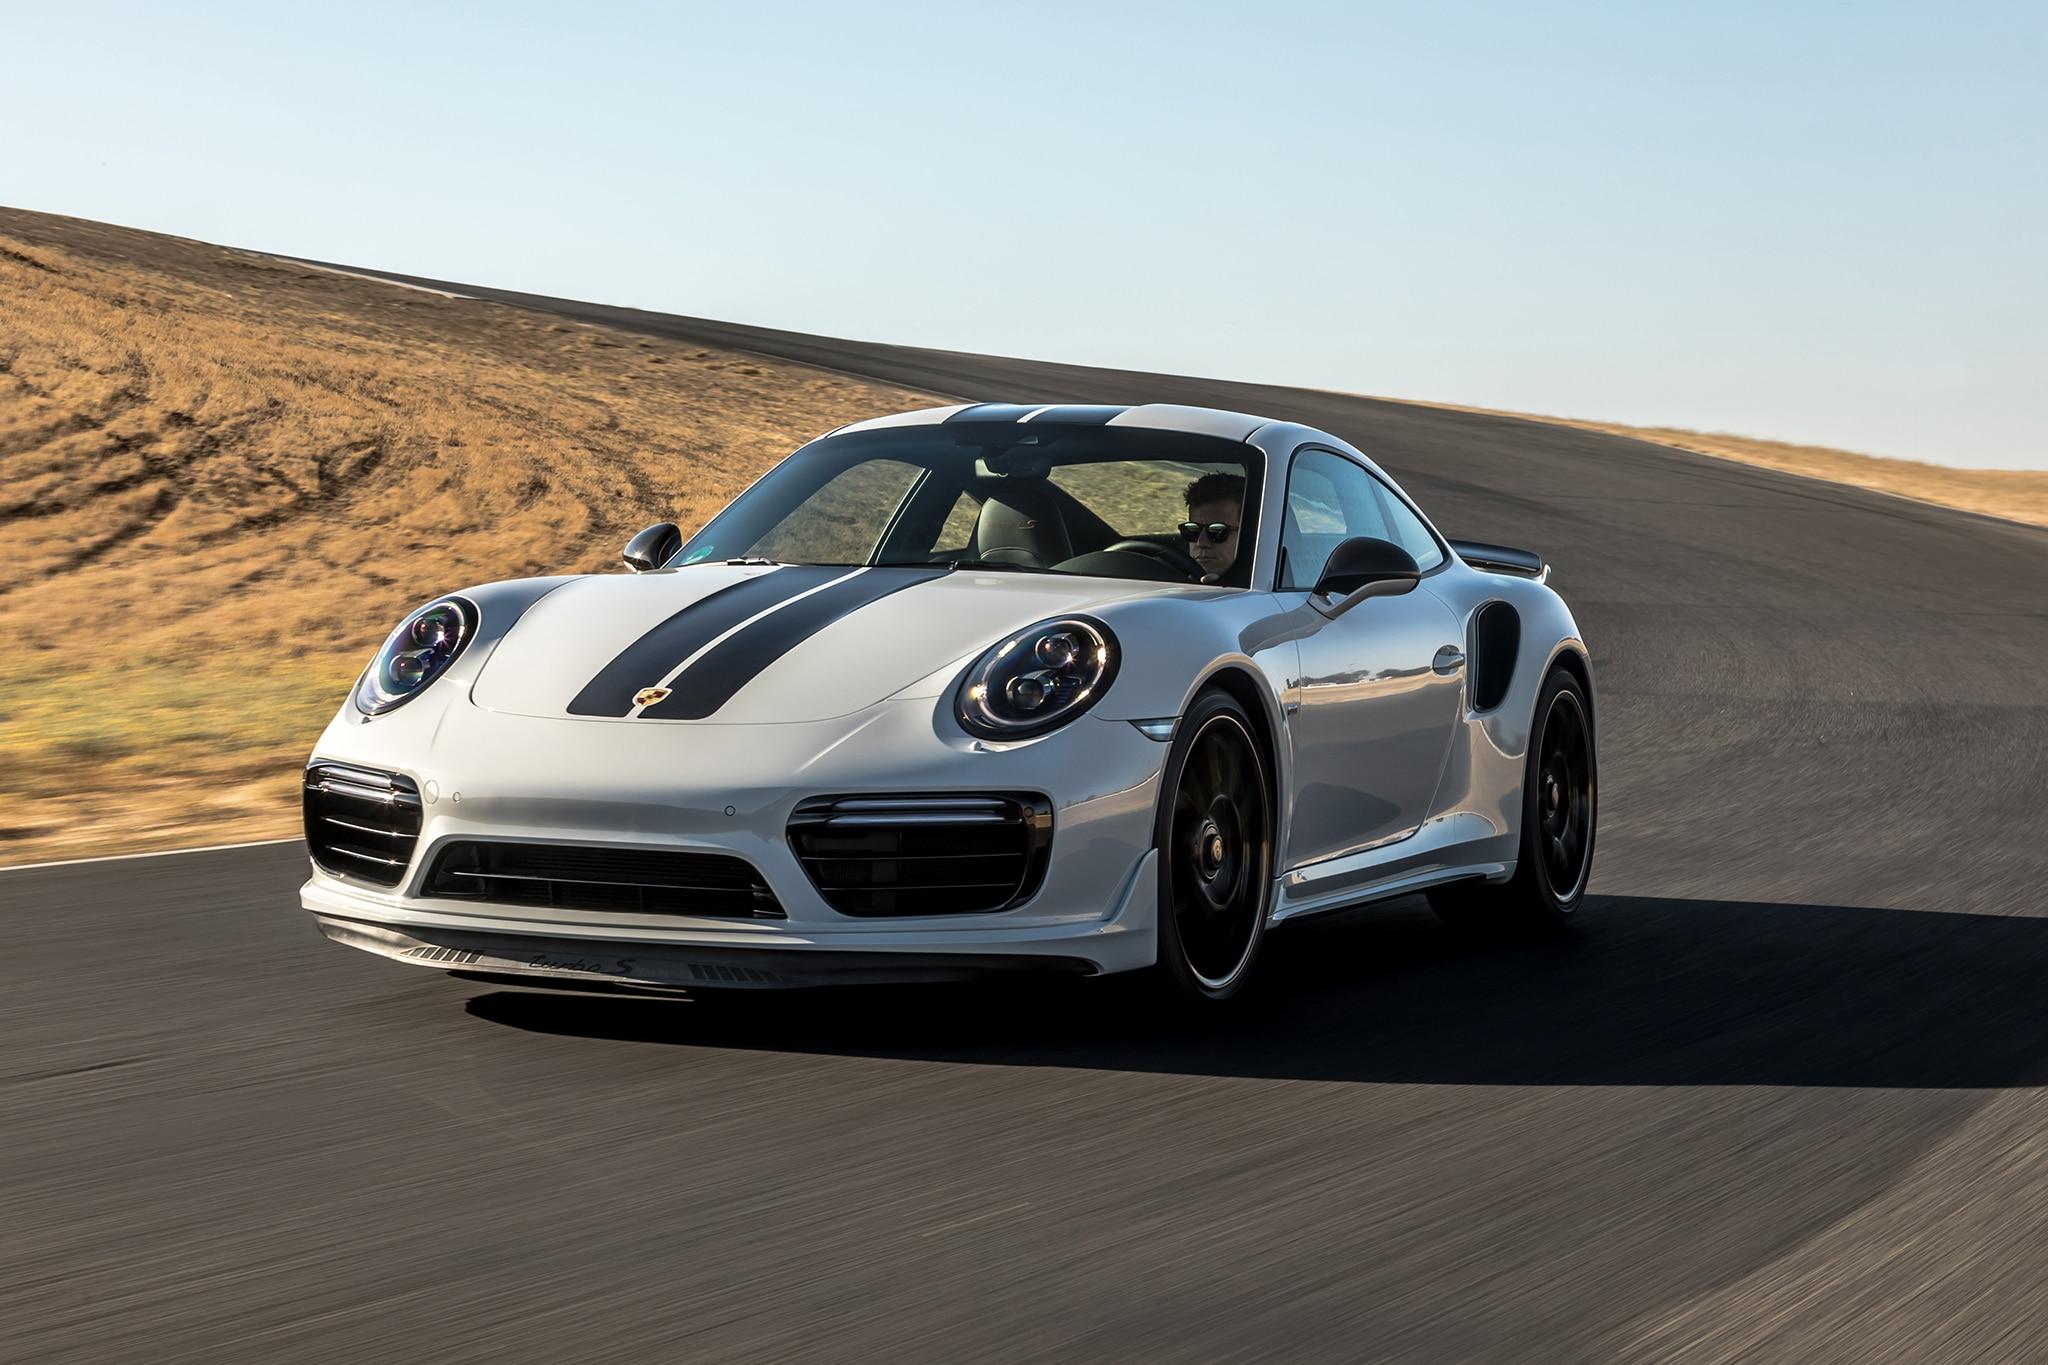 2018 Porsche 911 Turbo S Exclusive Front Three Quarter In Motion 06